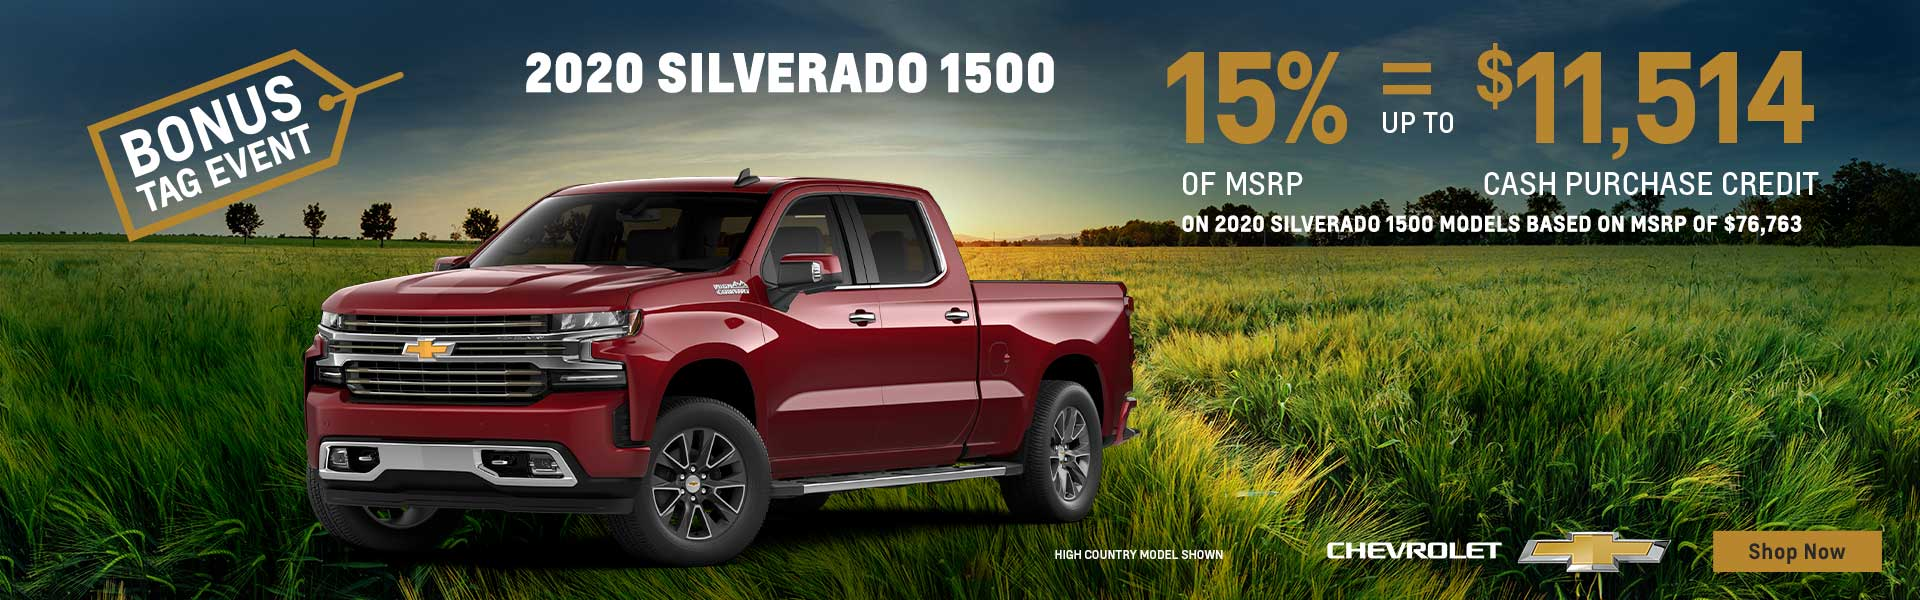 GMCCA - Western - Chevrolet Silverado 1500